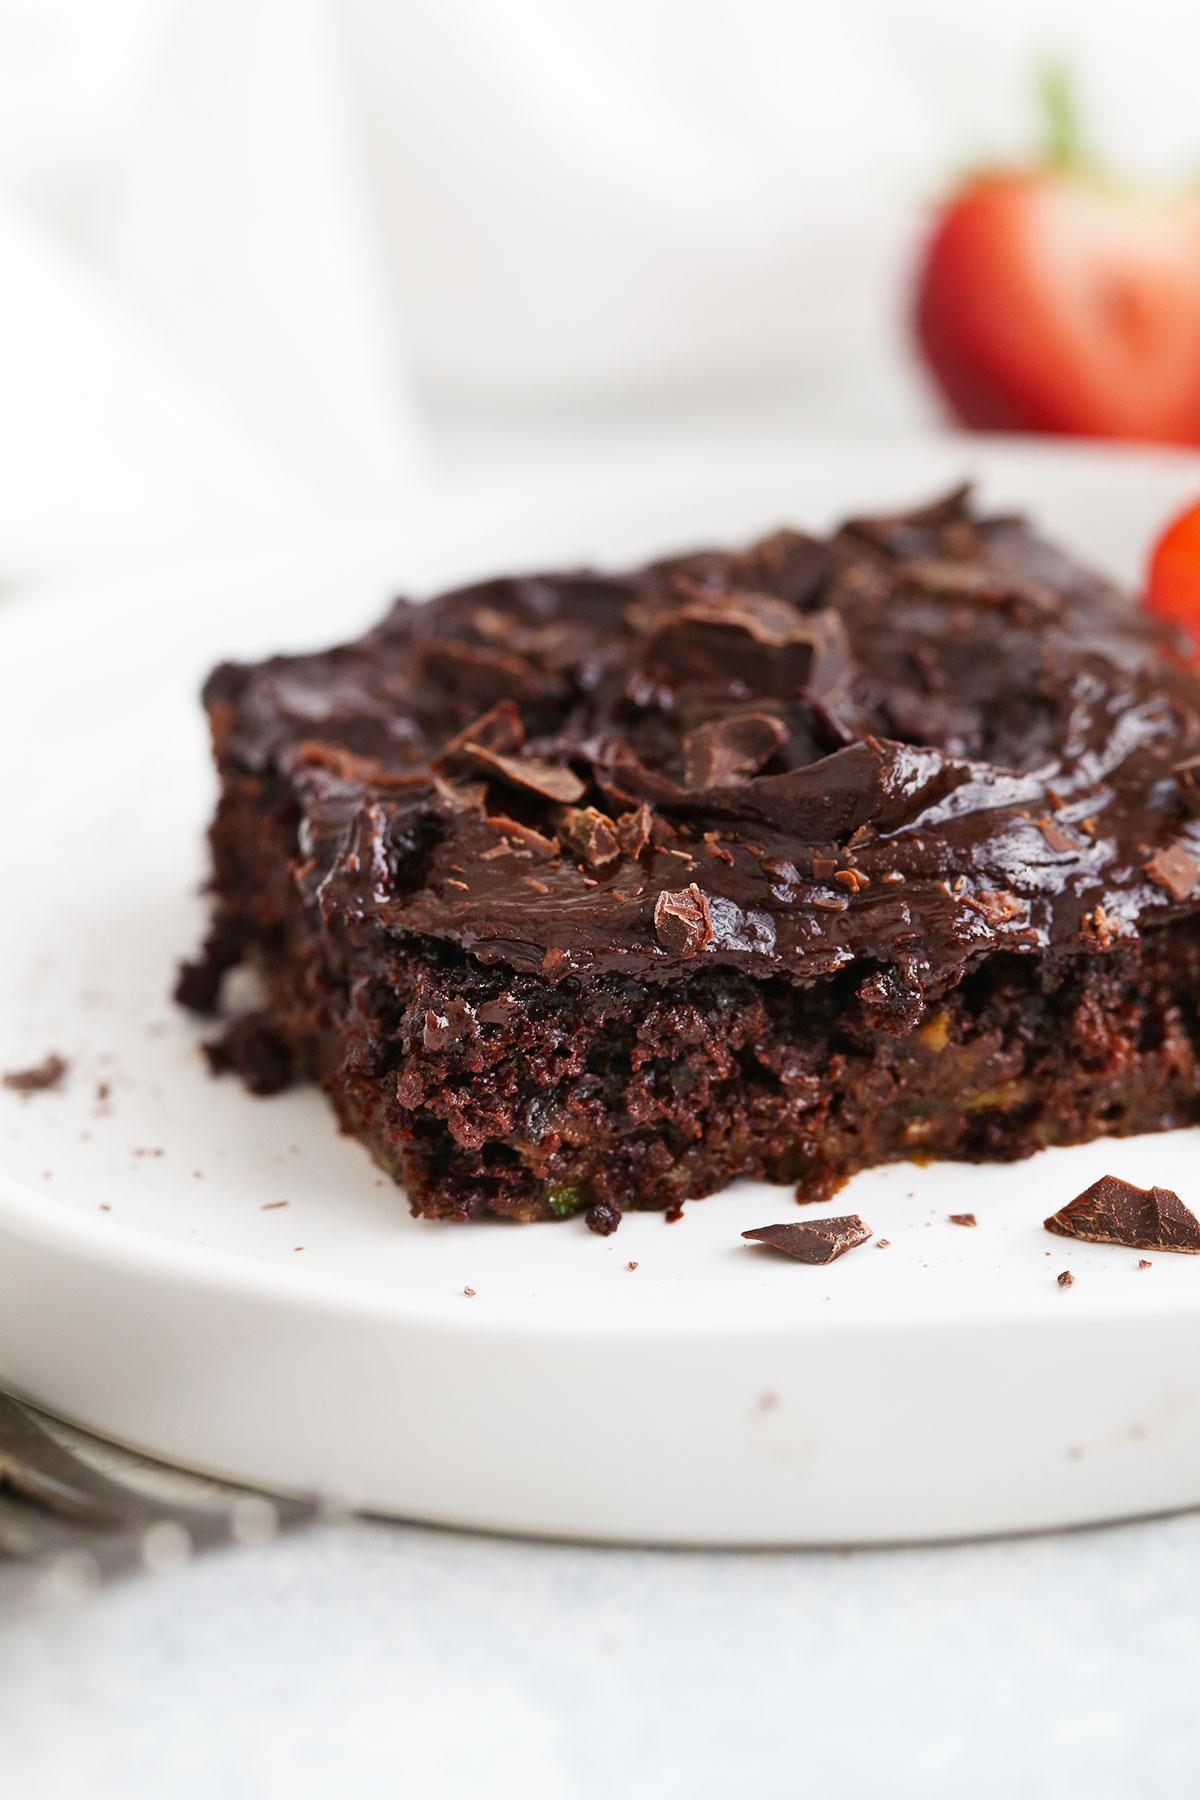 Close up view of Gluten Free Chocolate Zucchini Cake